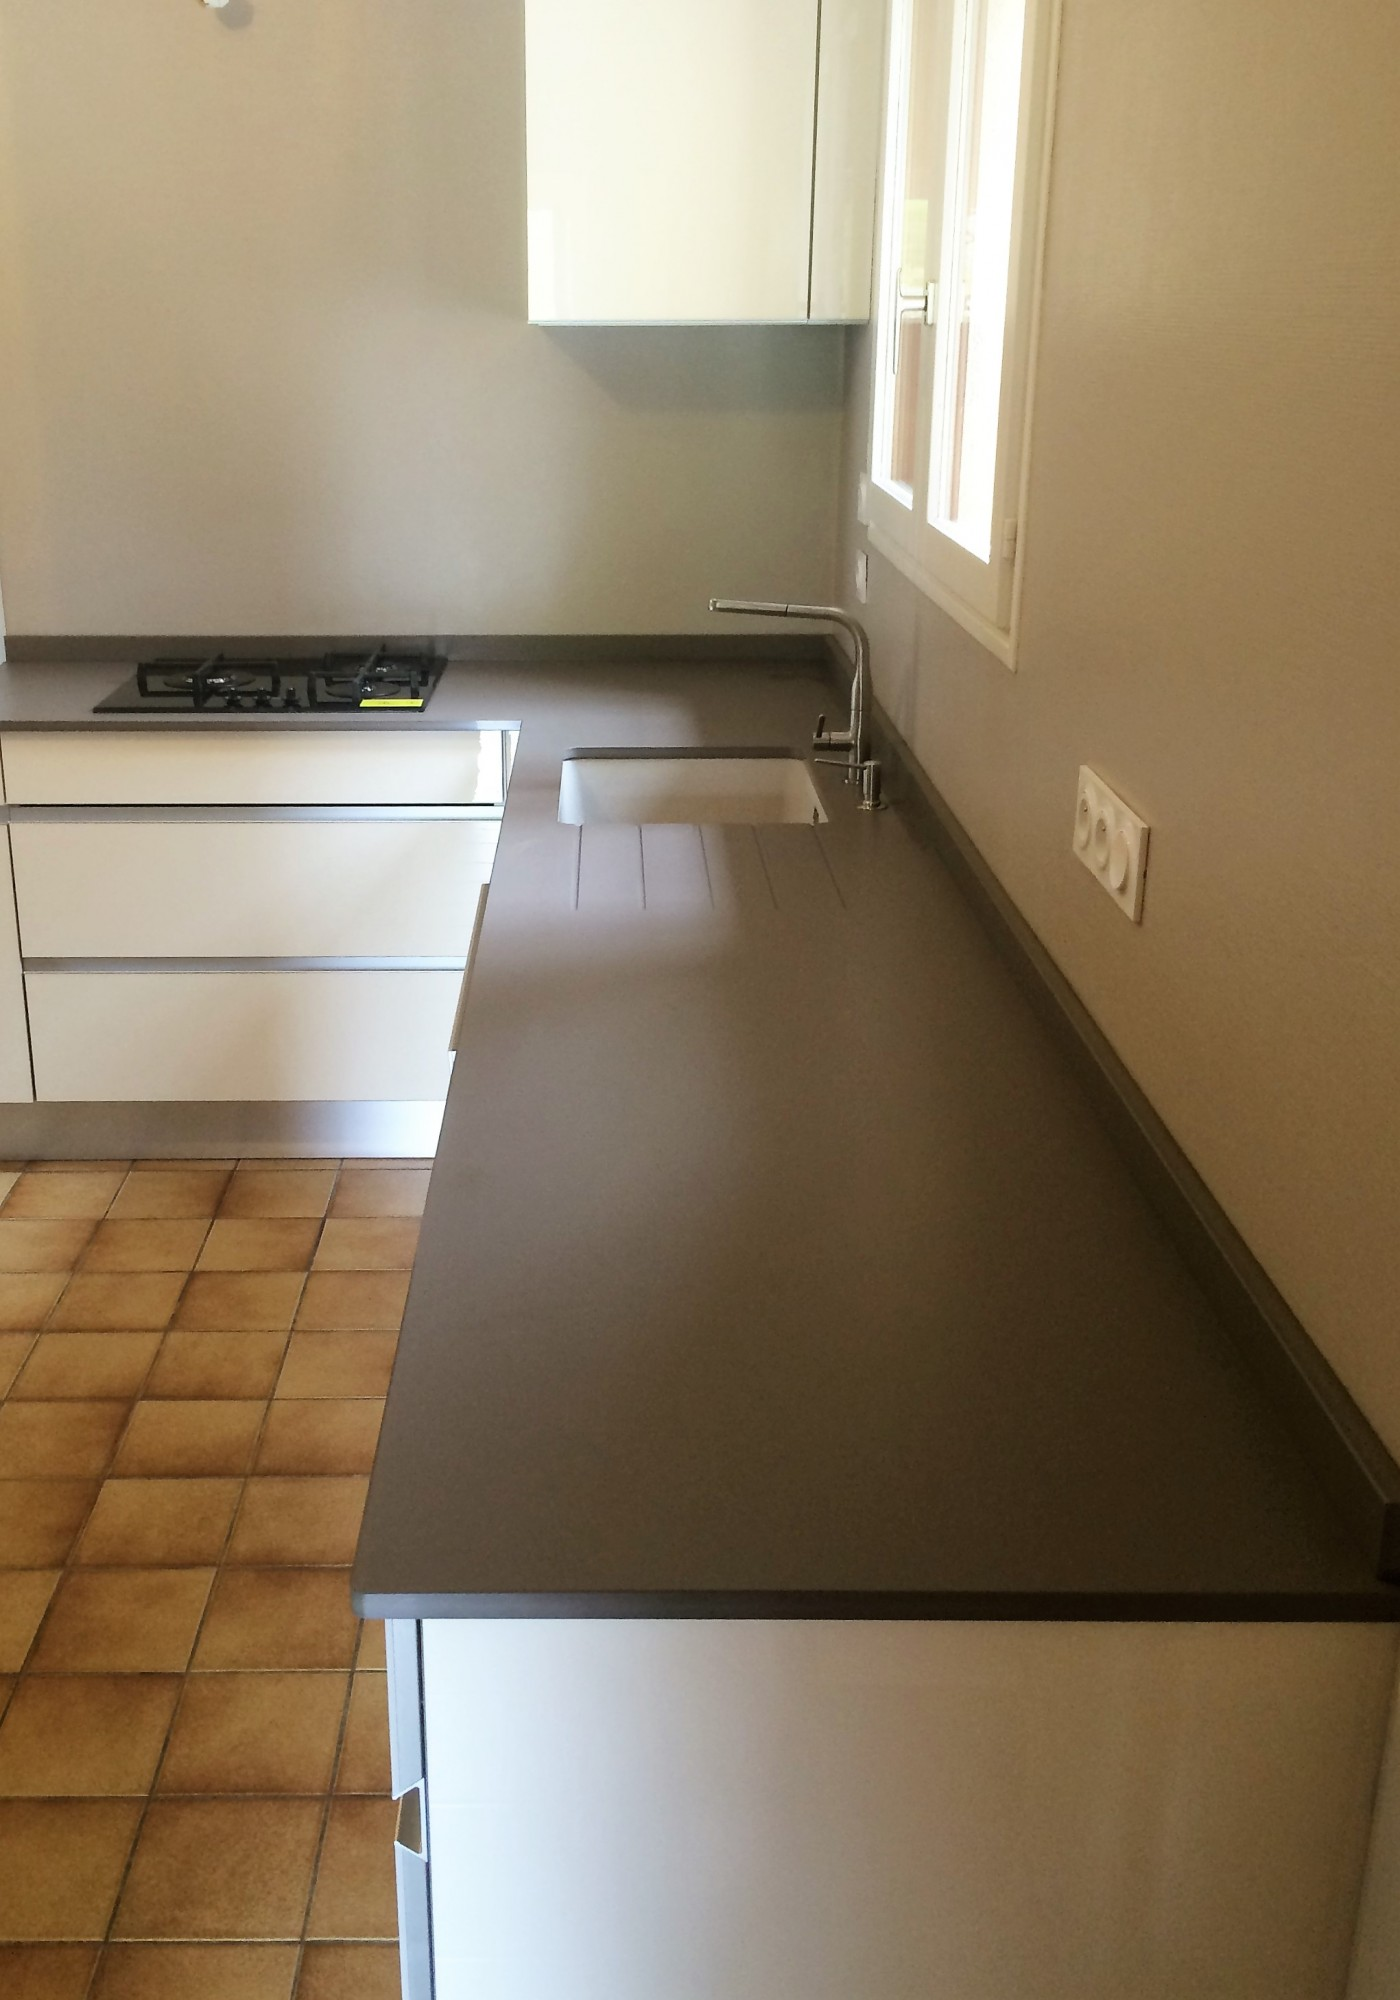 plan de travail dekton plan de travail en marbre with plan de travail dekton excellent plan de. Black Bedroom Furniture Sets. Home Design Ideas